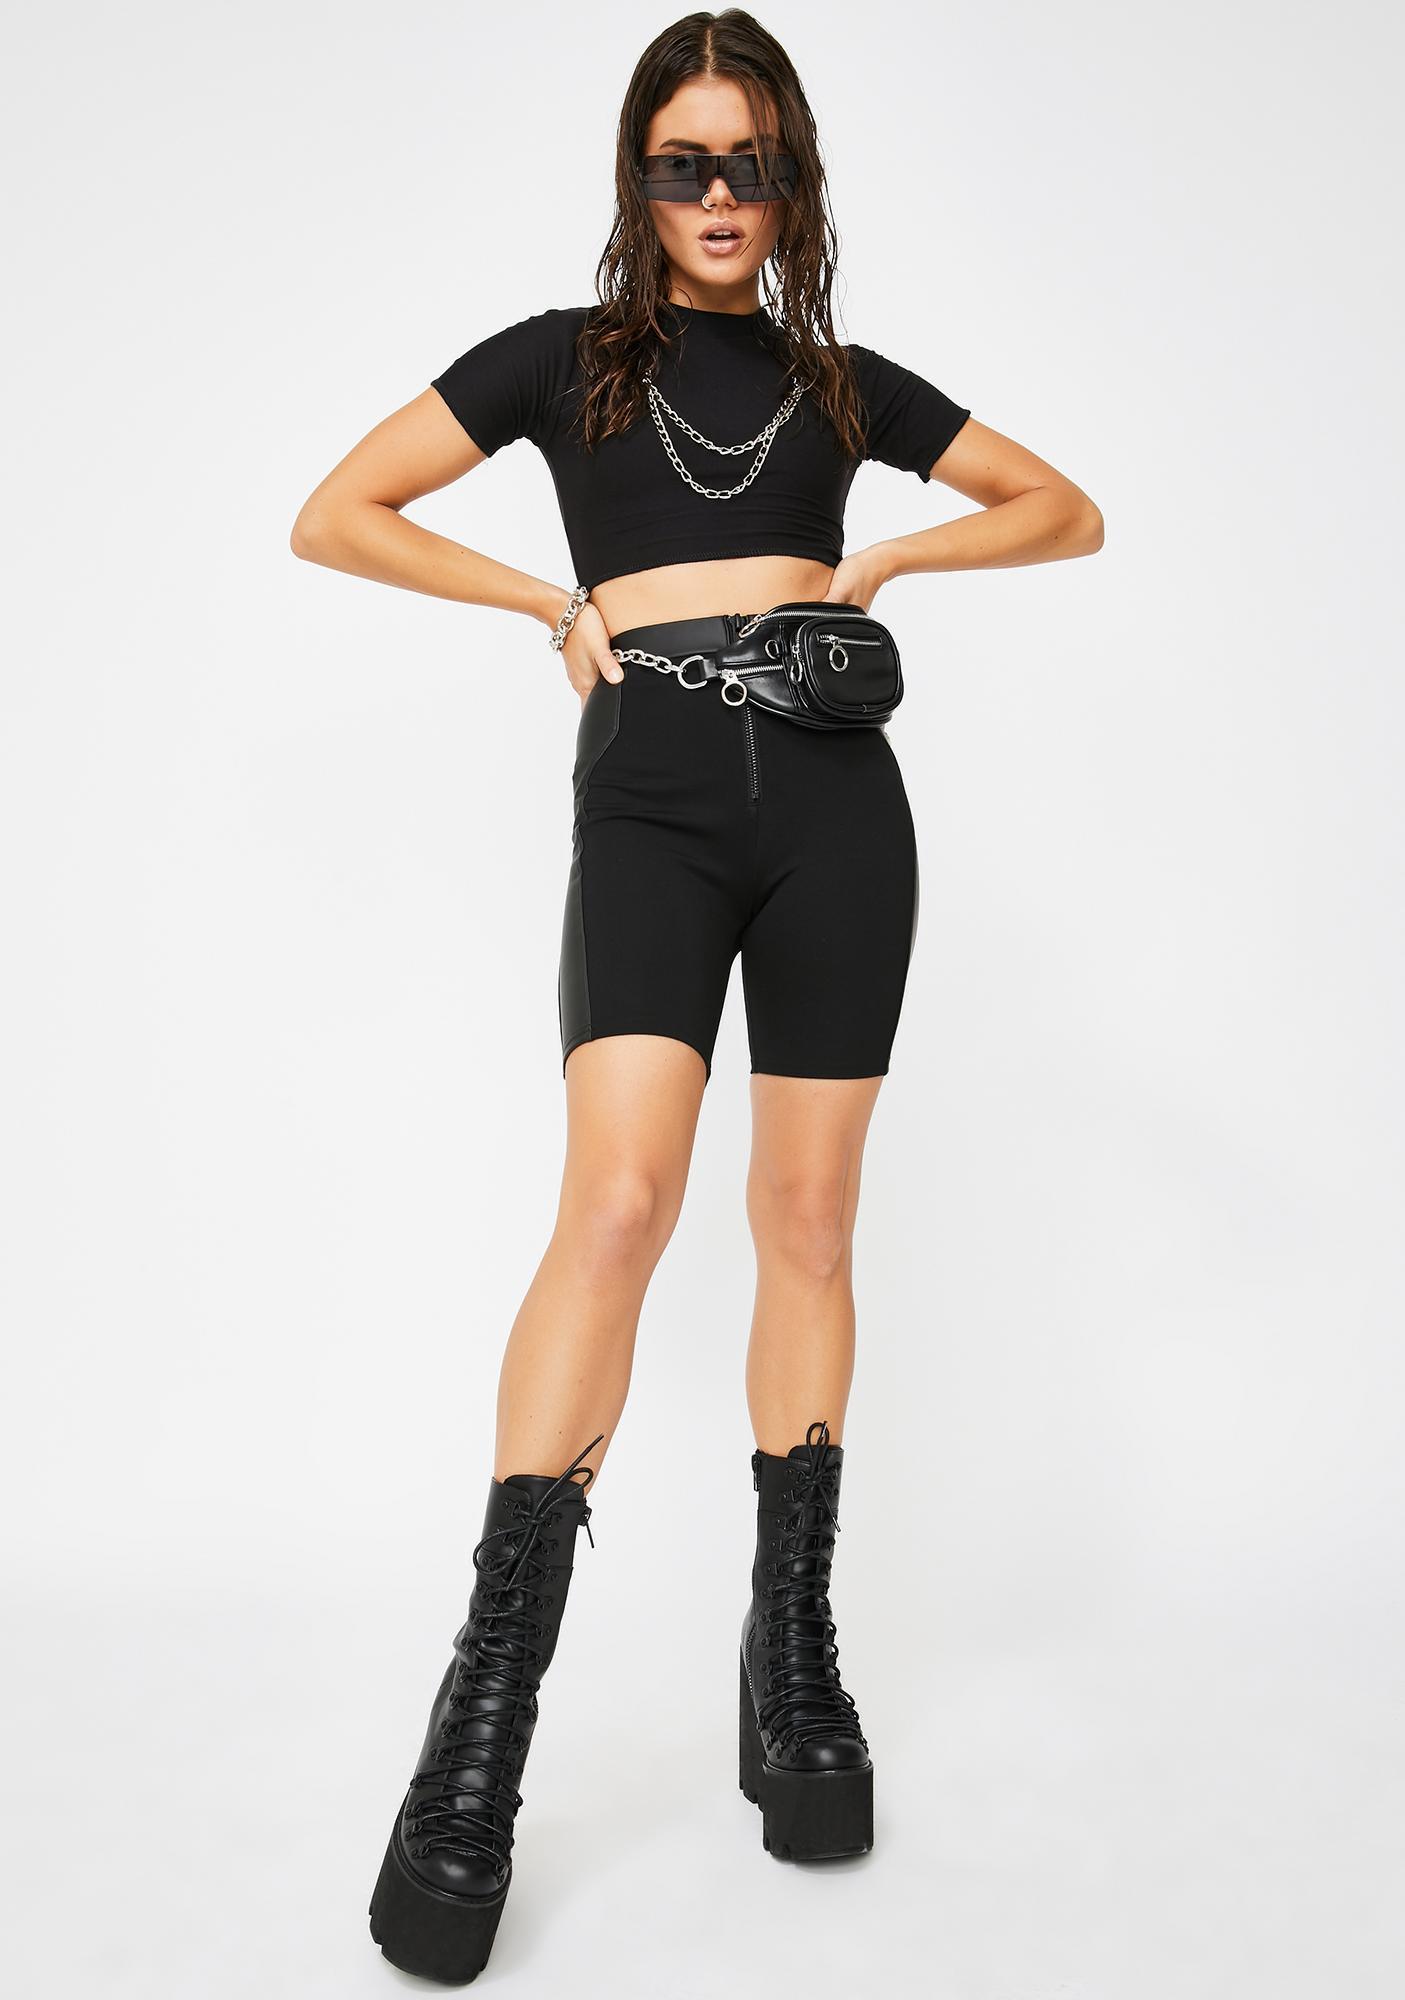 Riccetti Clothing Black Chain Reaction Crop Top